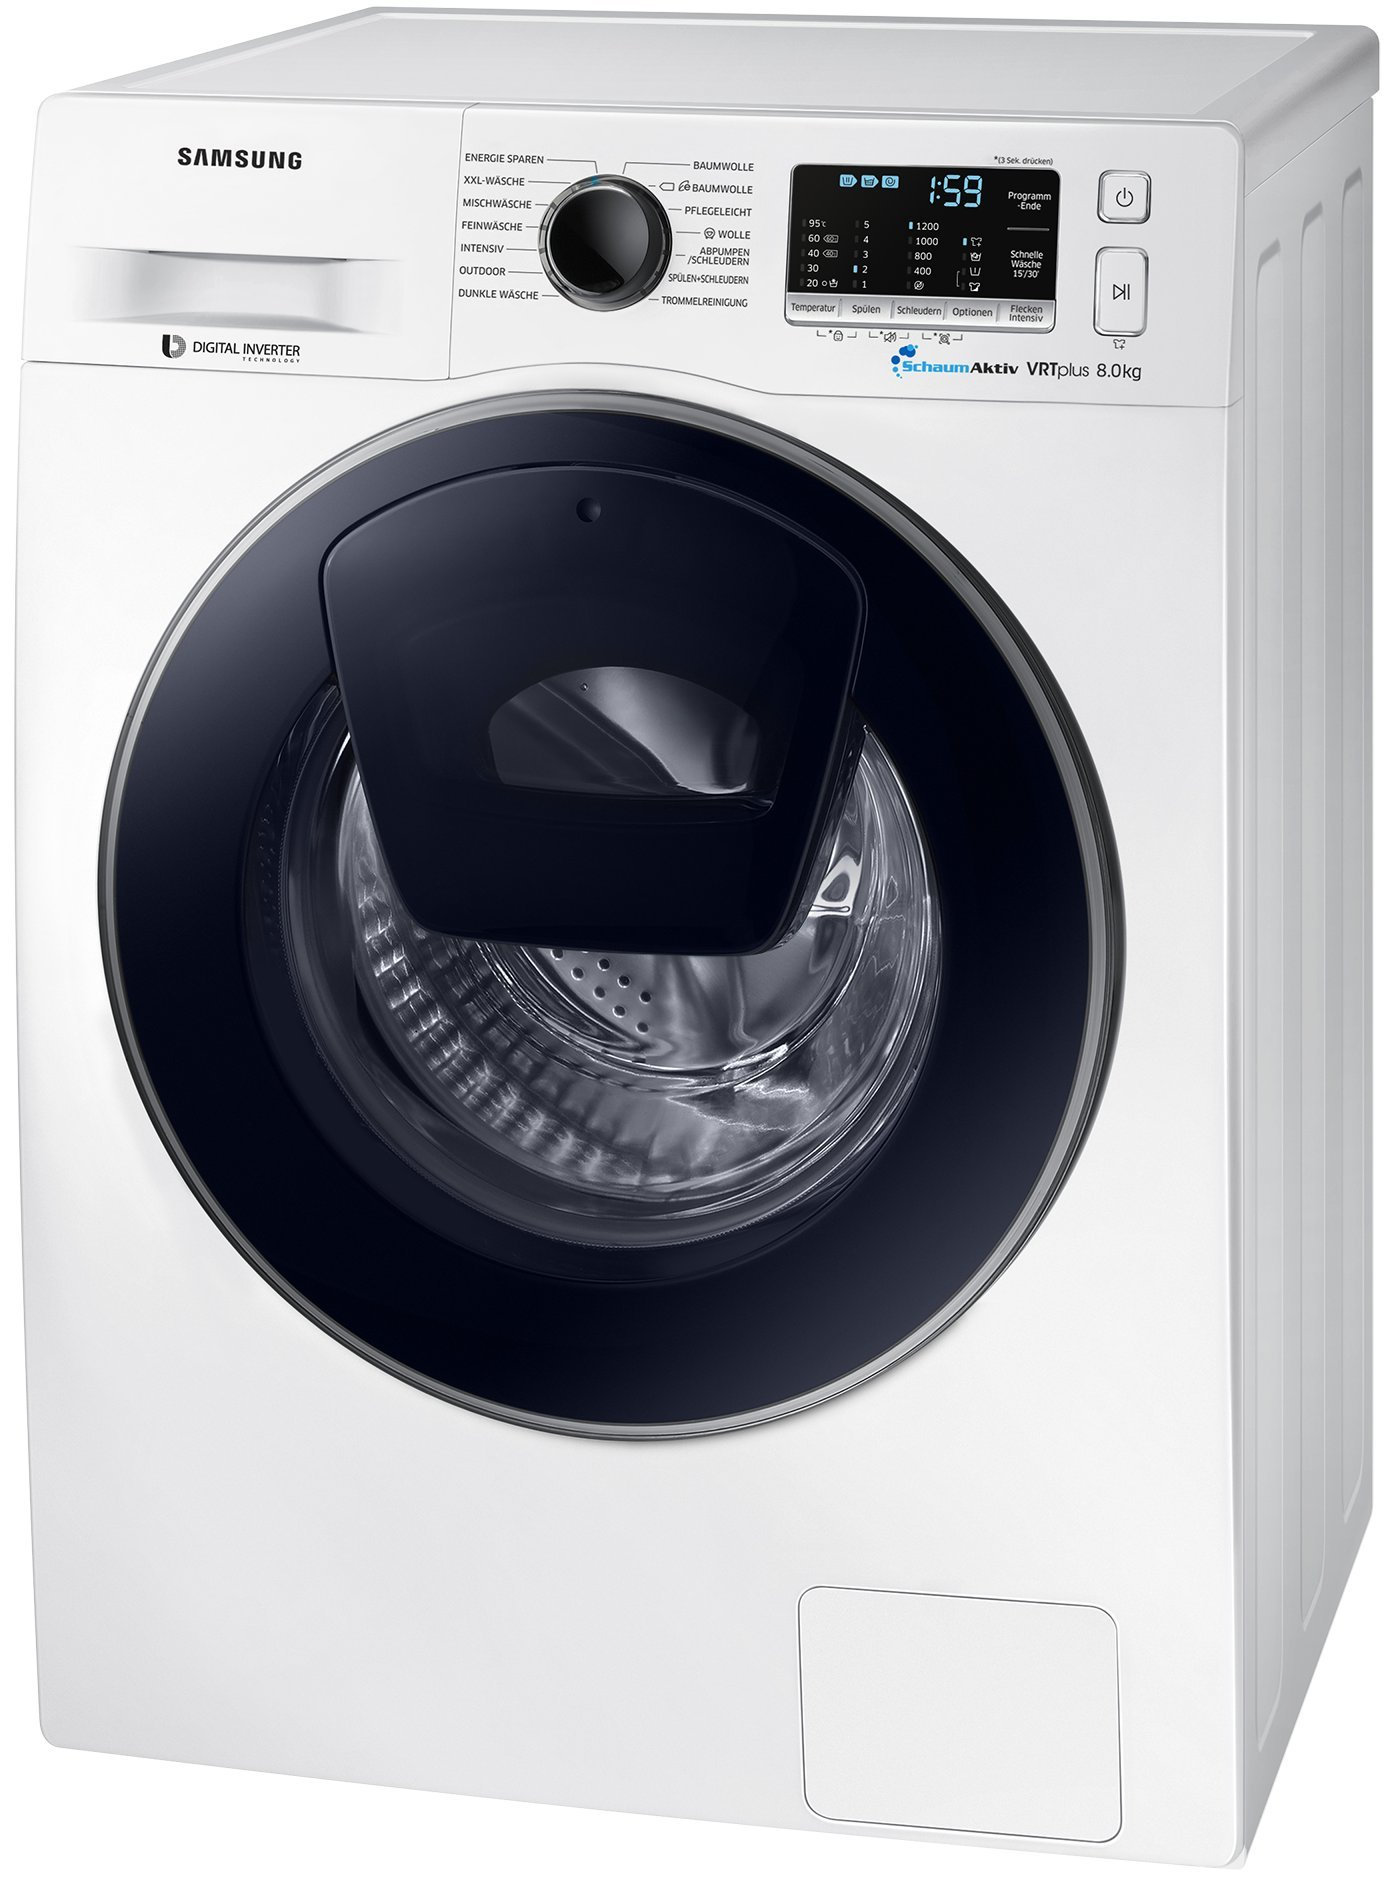 Samsung-SLIM-WW5500-WW80K52A0VWEG-AddWash-Waschmaschine-A-1200-Umin-8-kg-ECO-Trommelreinigung